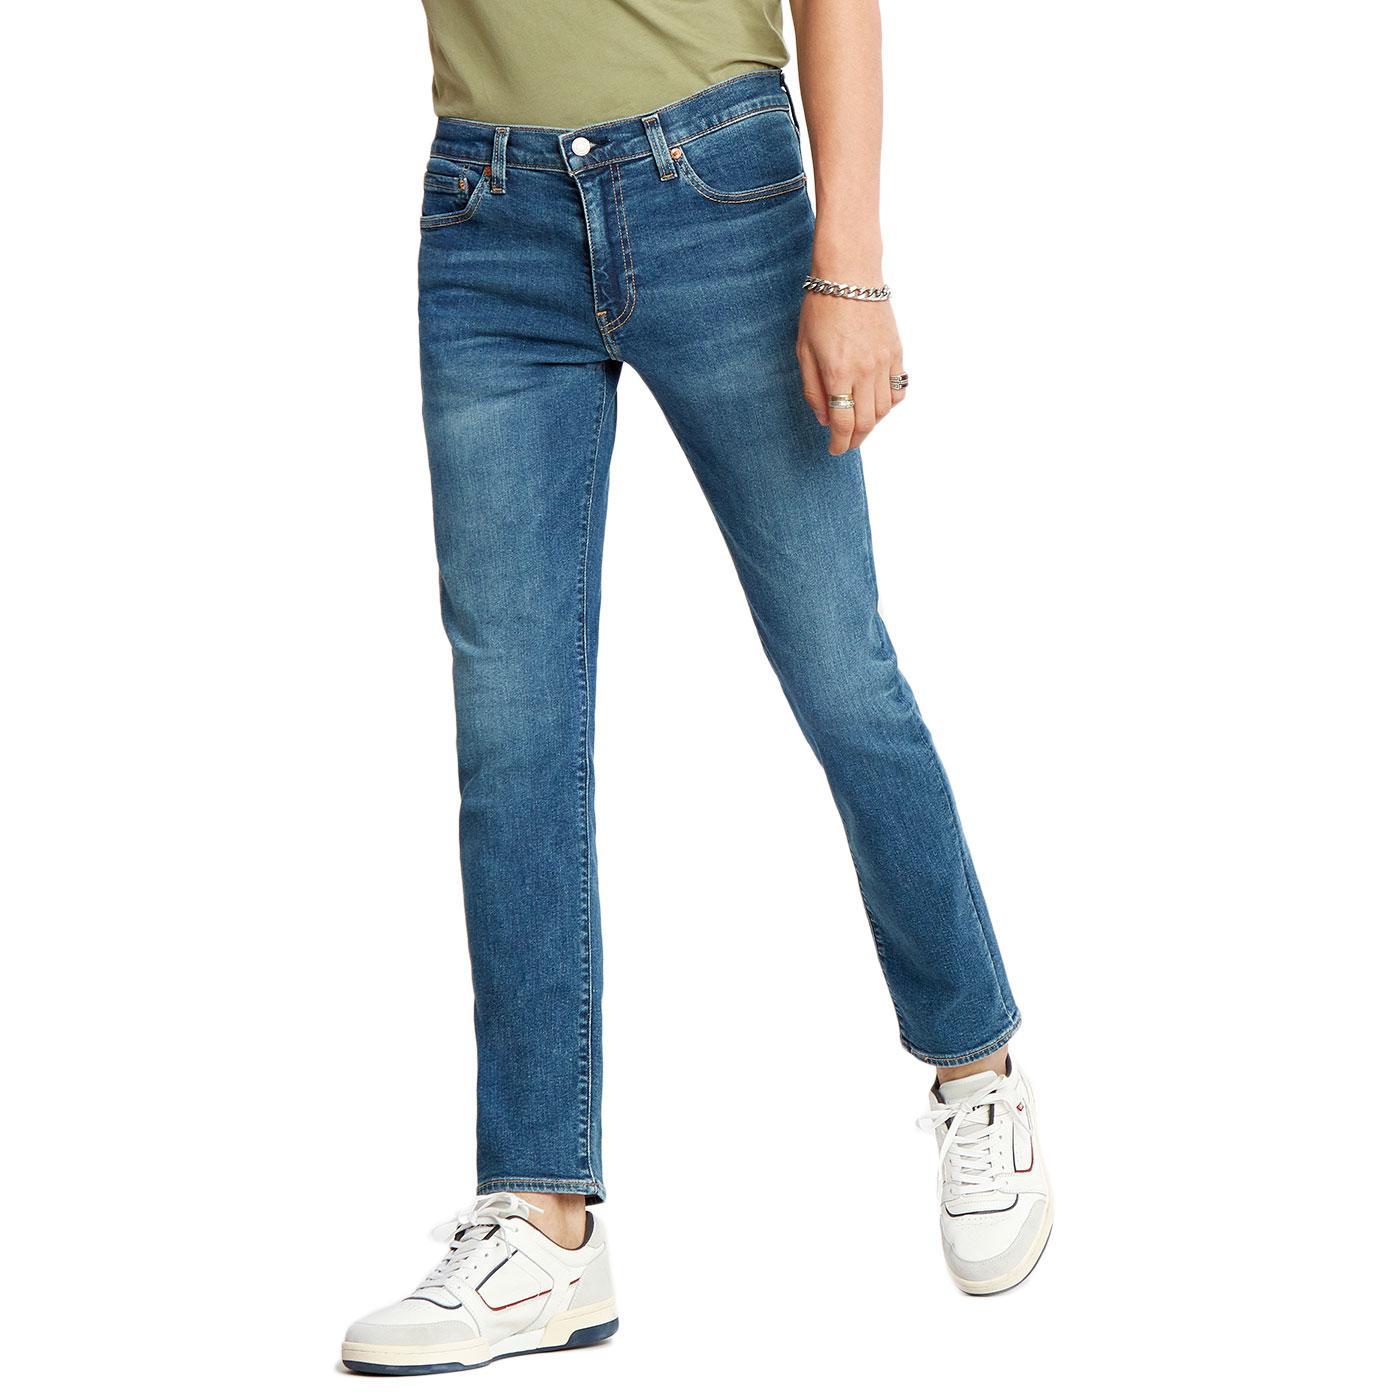 LEVI'S 511 Flex Men's Slim Jeans (Cedar Nest Adv)